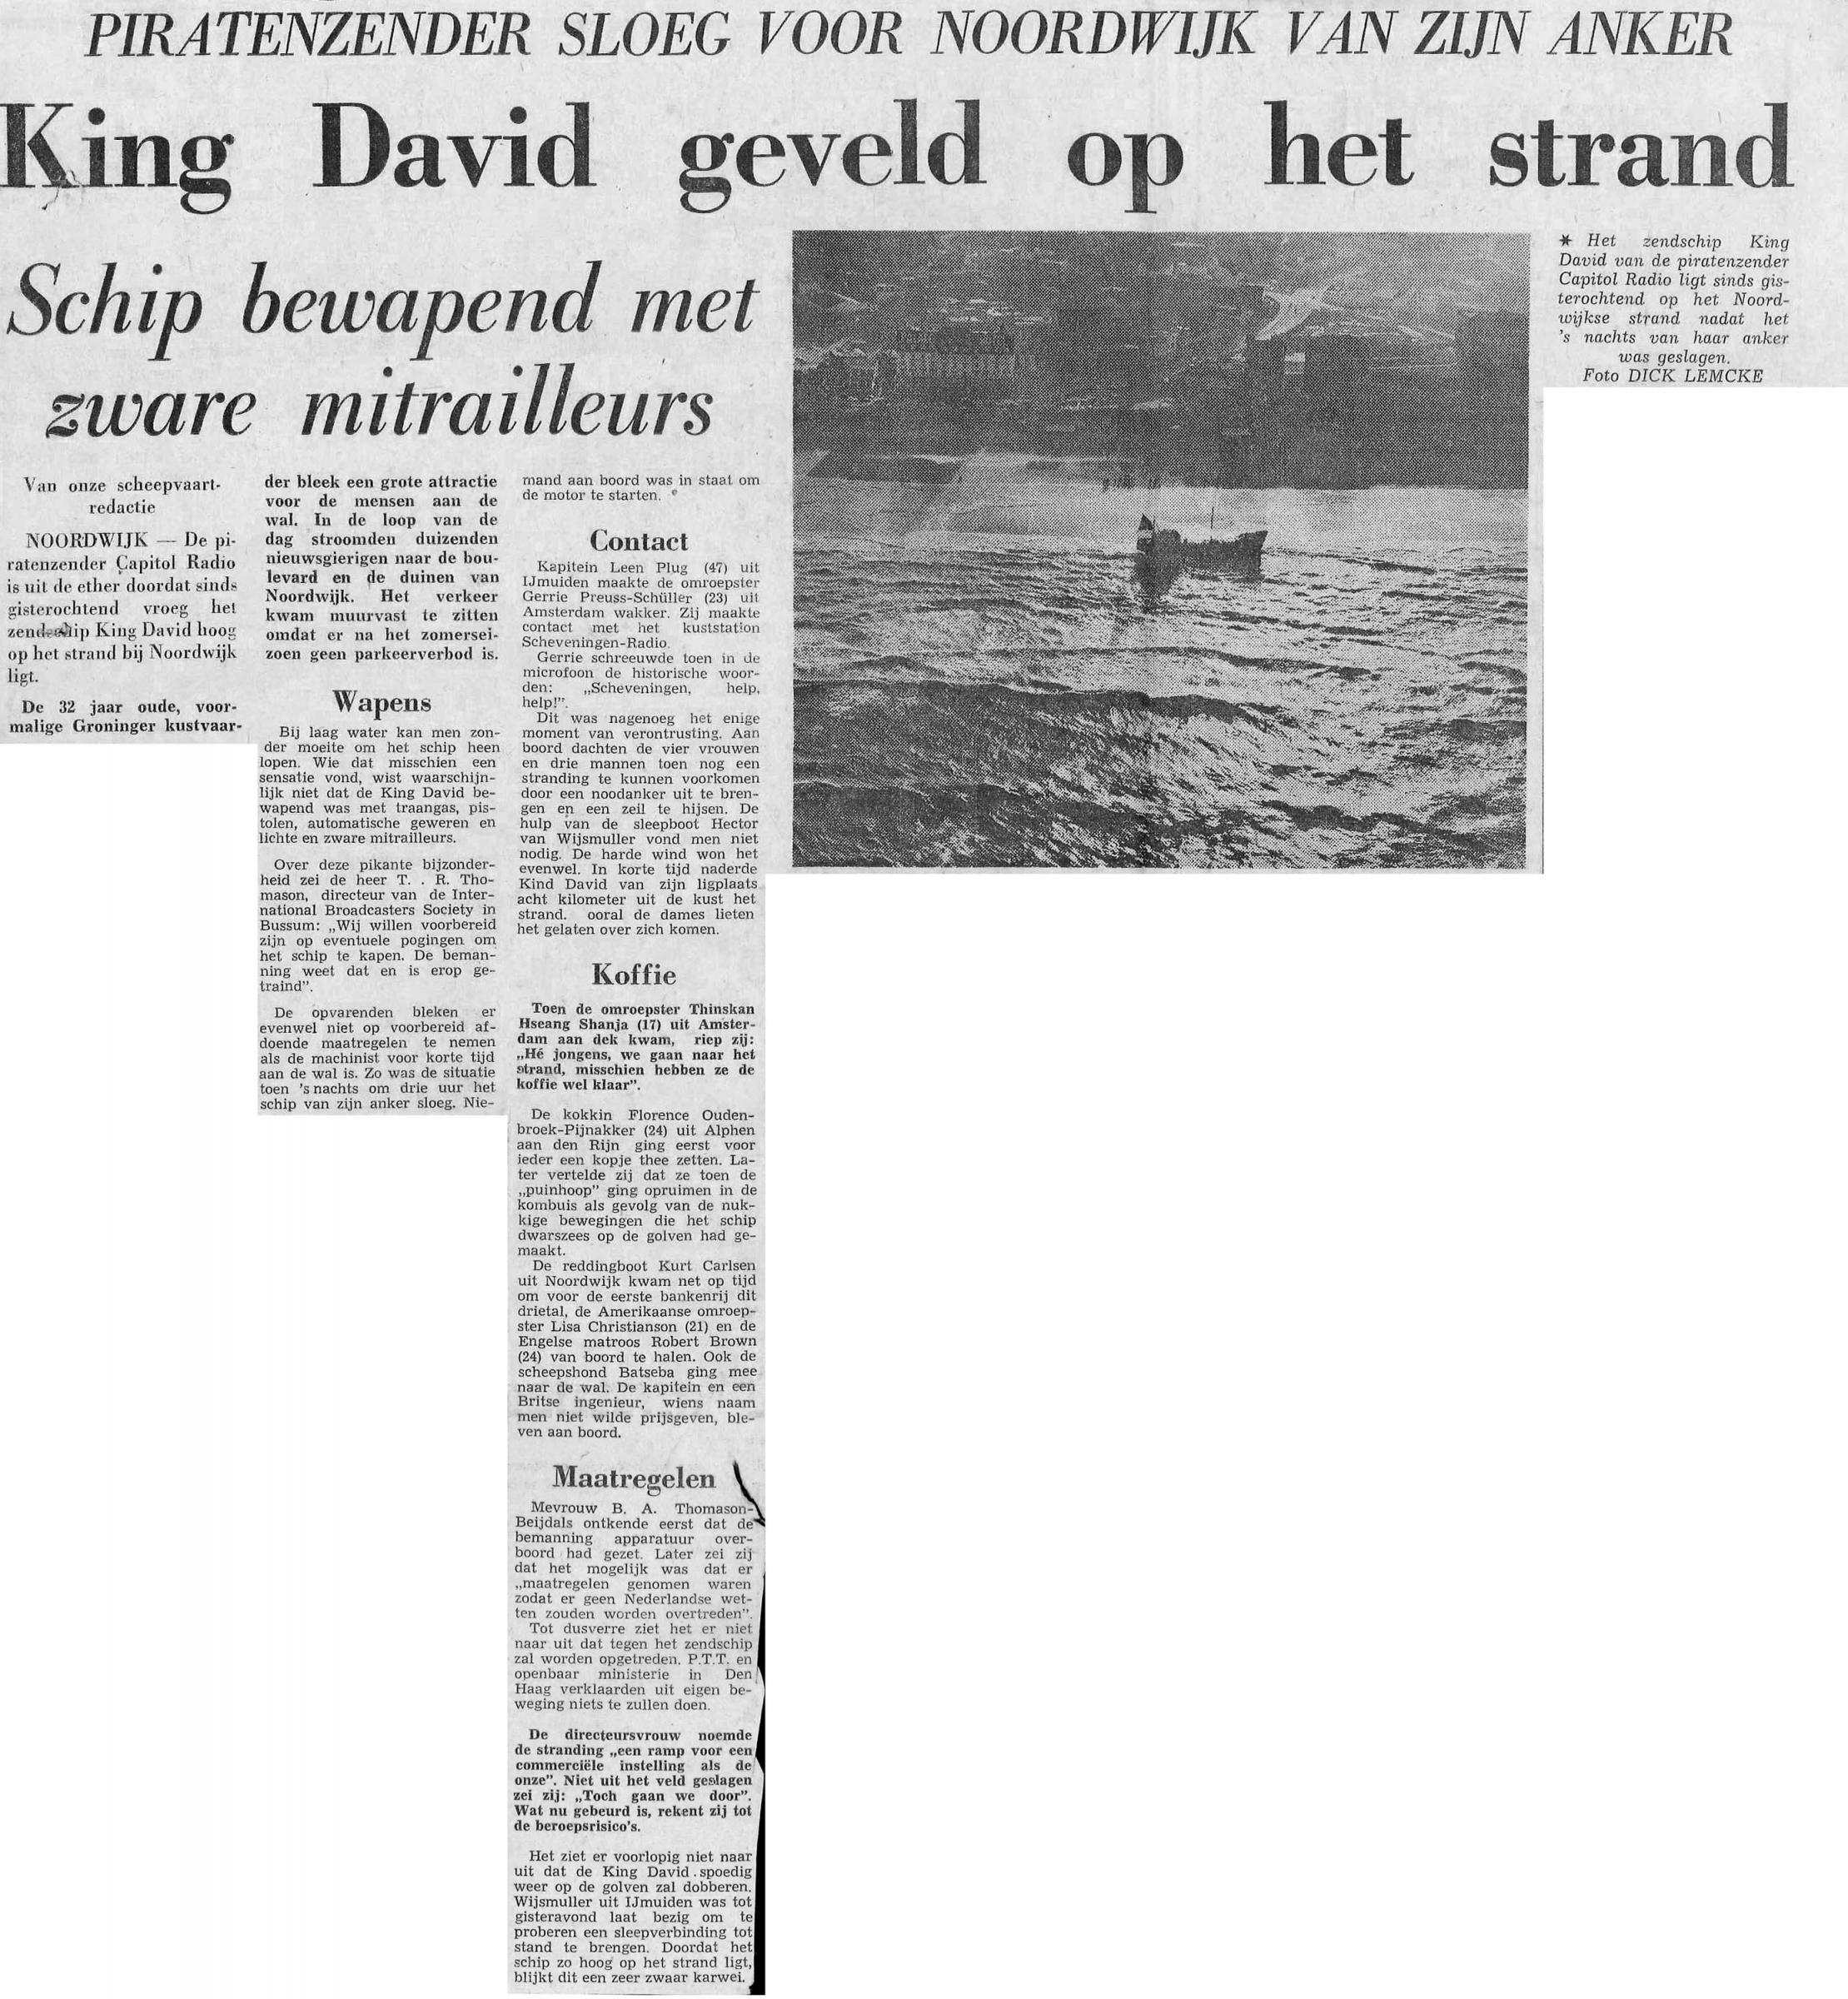 19701112_RG_King David geveld op strand.jpg